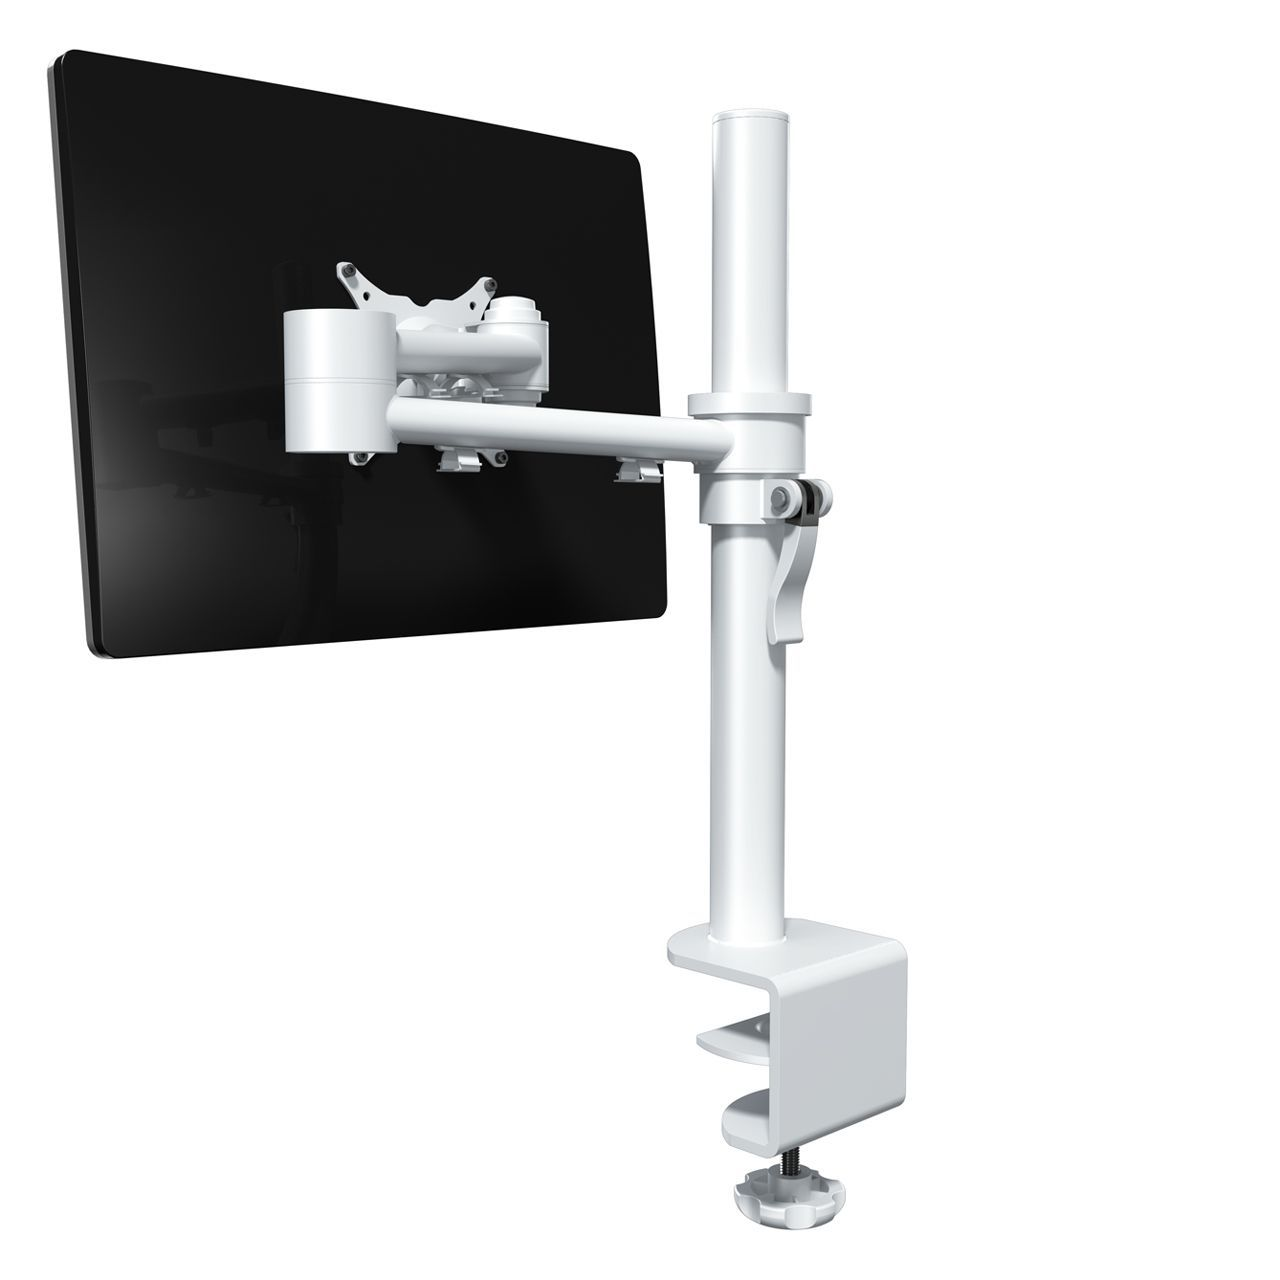 viewmate ecoline monitorarm flatscreen en monitorsteunen ERKAVME01 Achterzijde